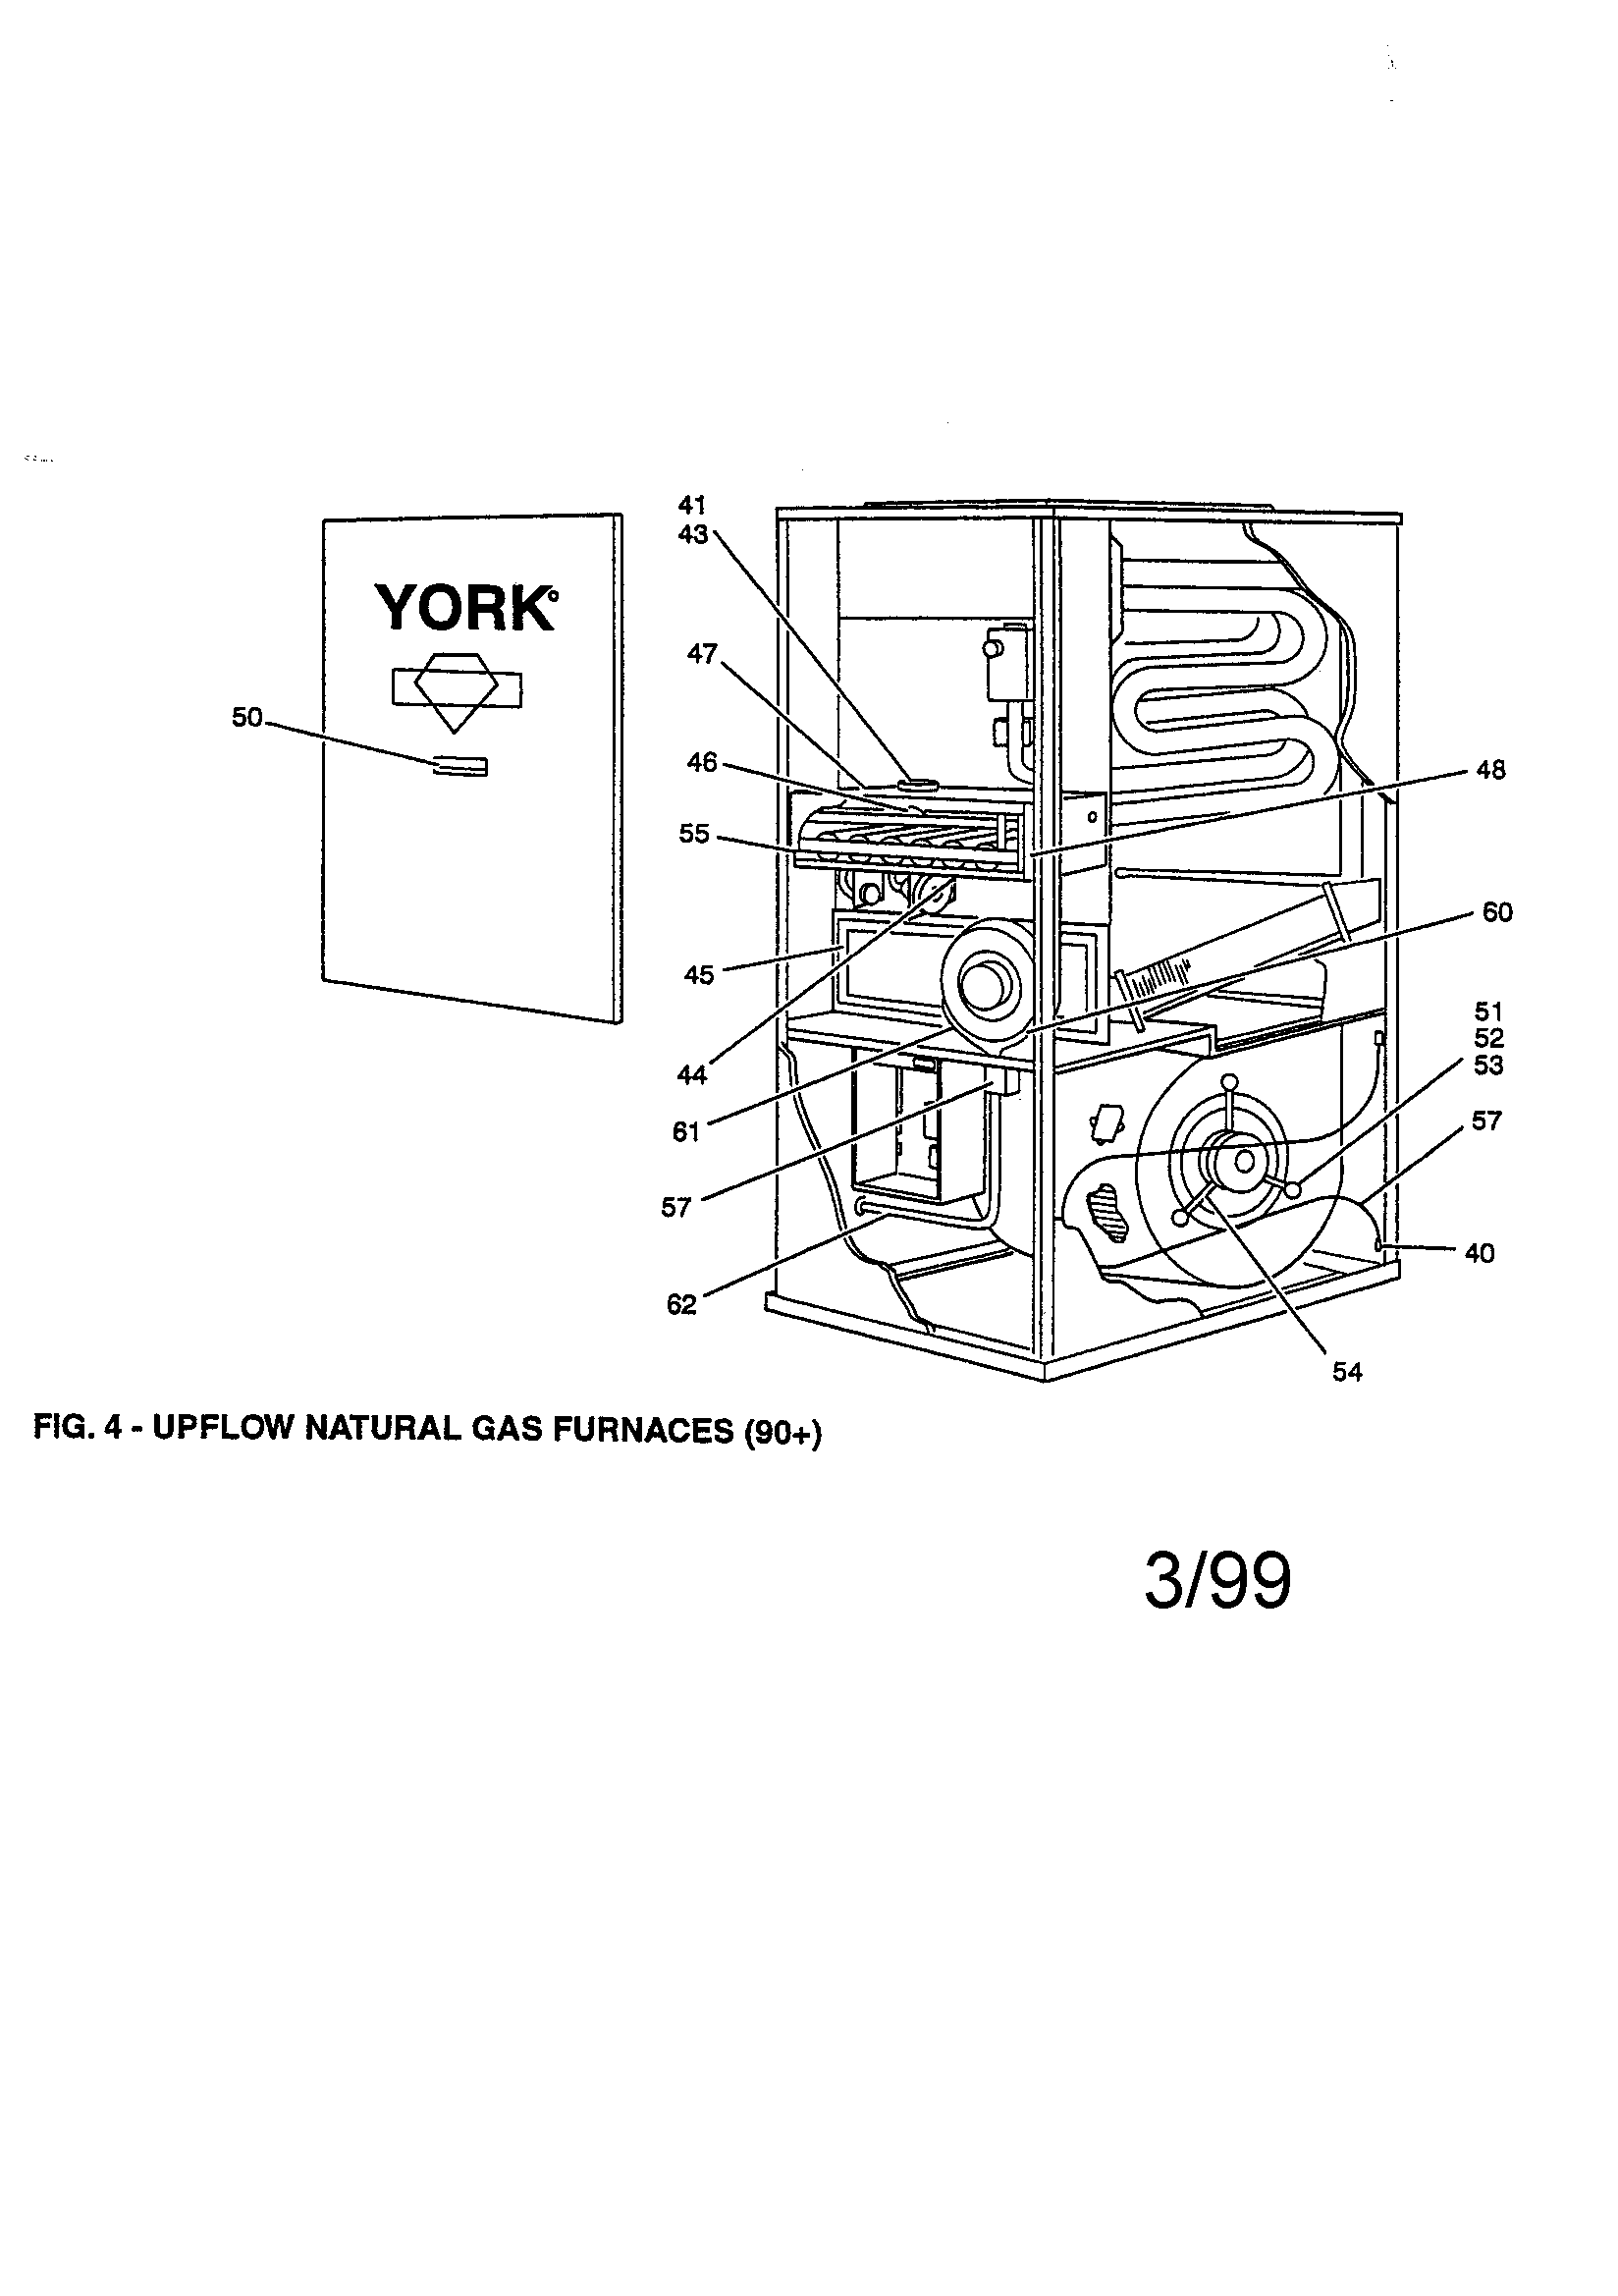 York model P3URD20N11201A furnace/heater, gas genuine parts